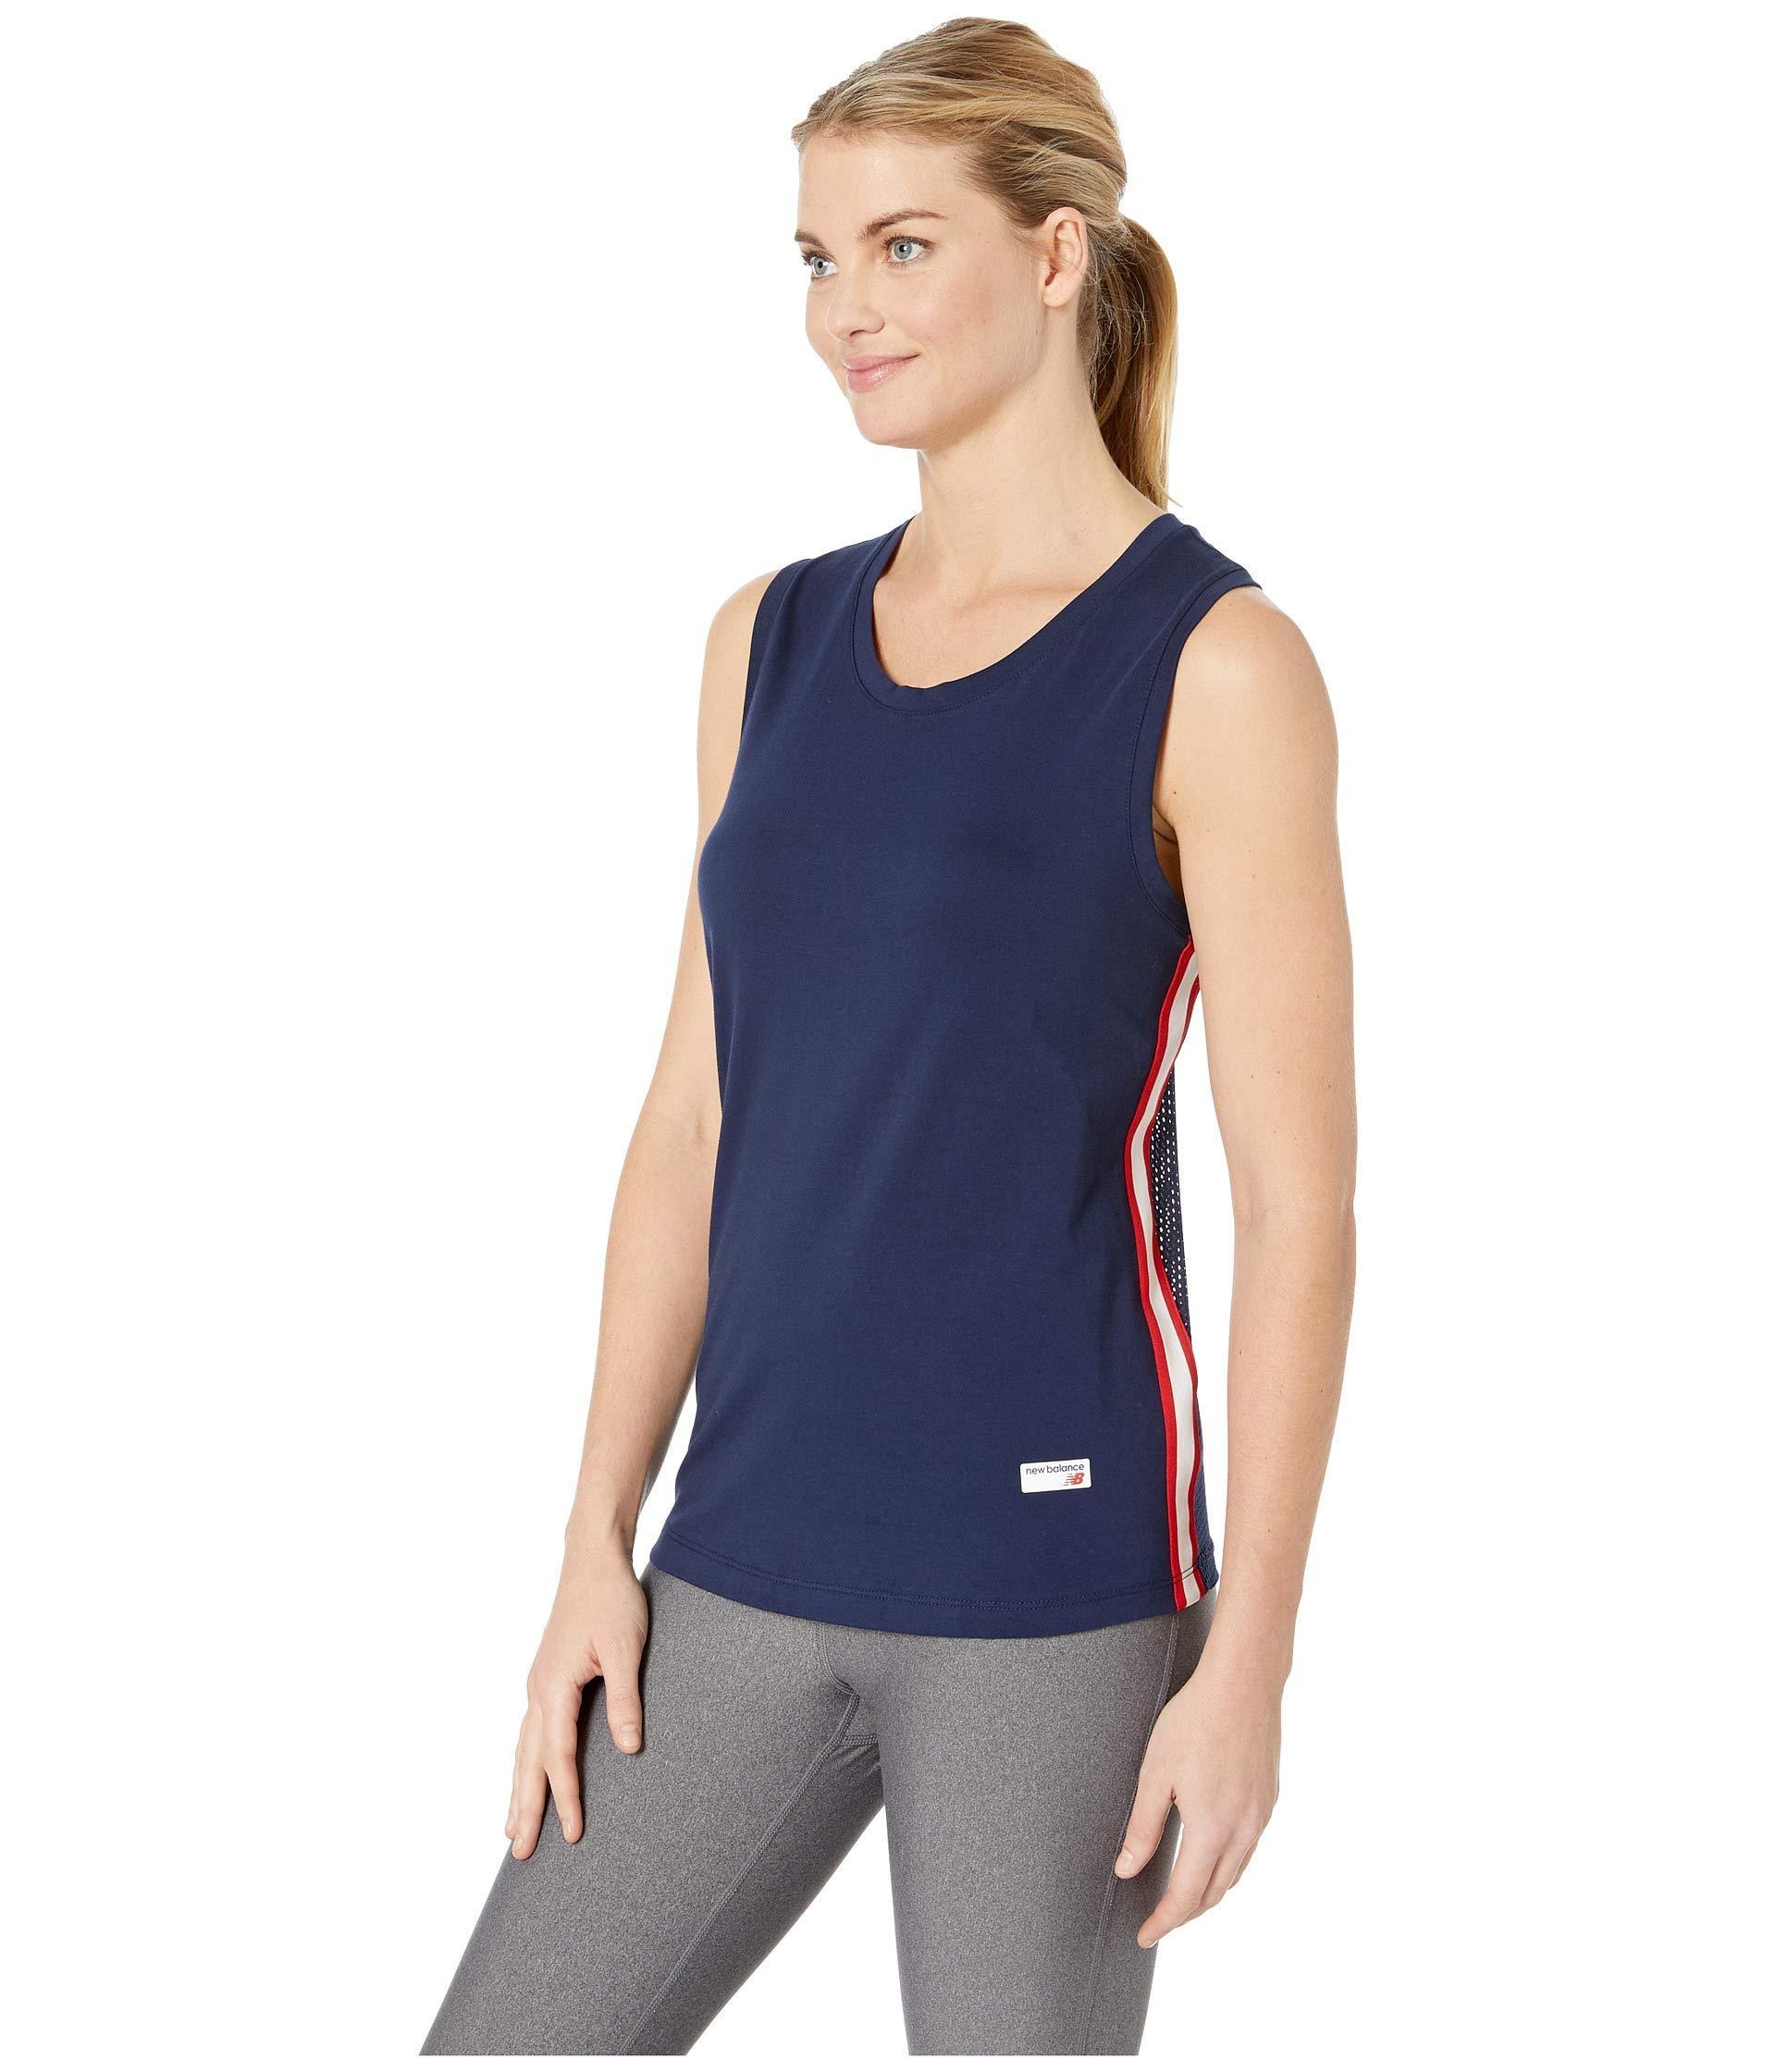 029ed05c2e981 Lyst - New Balance Athletics Racerback Tank Top (black white) Women s  Sleeveless in Blue